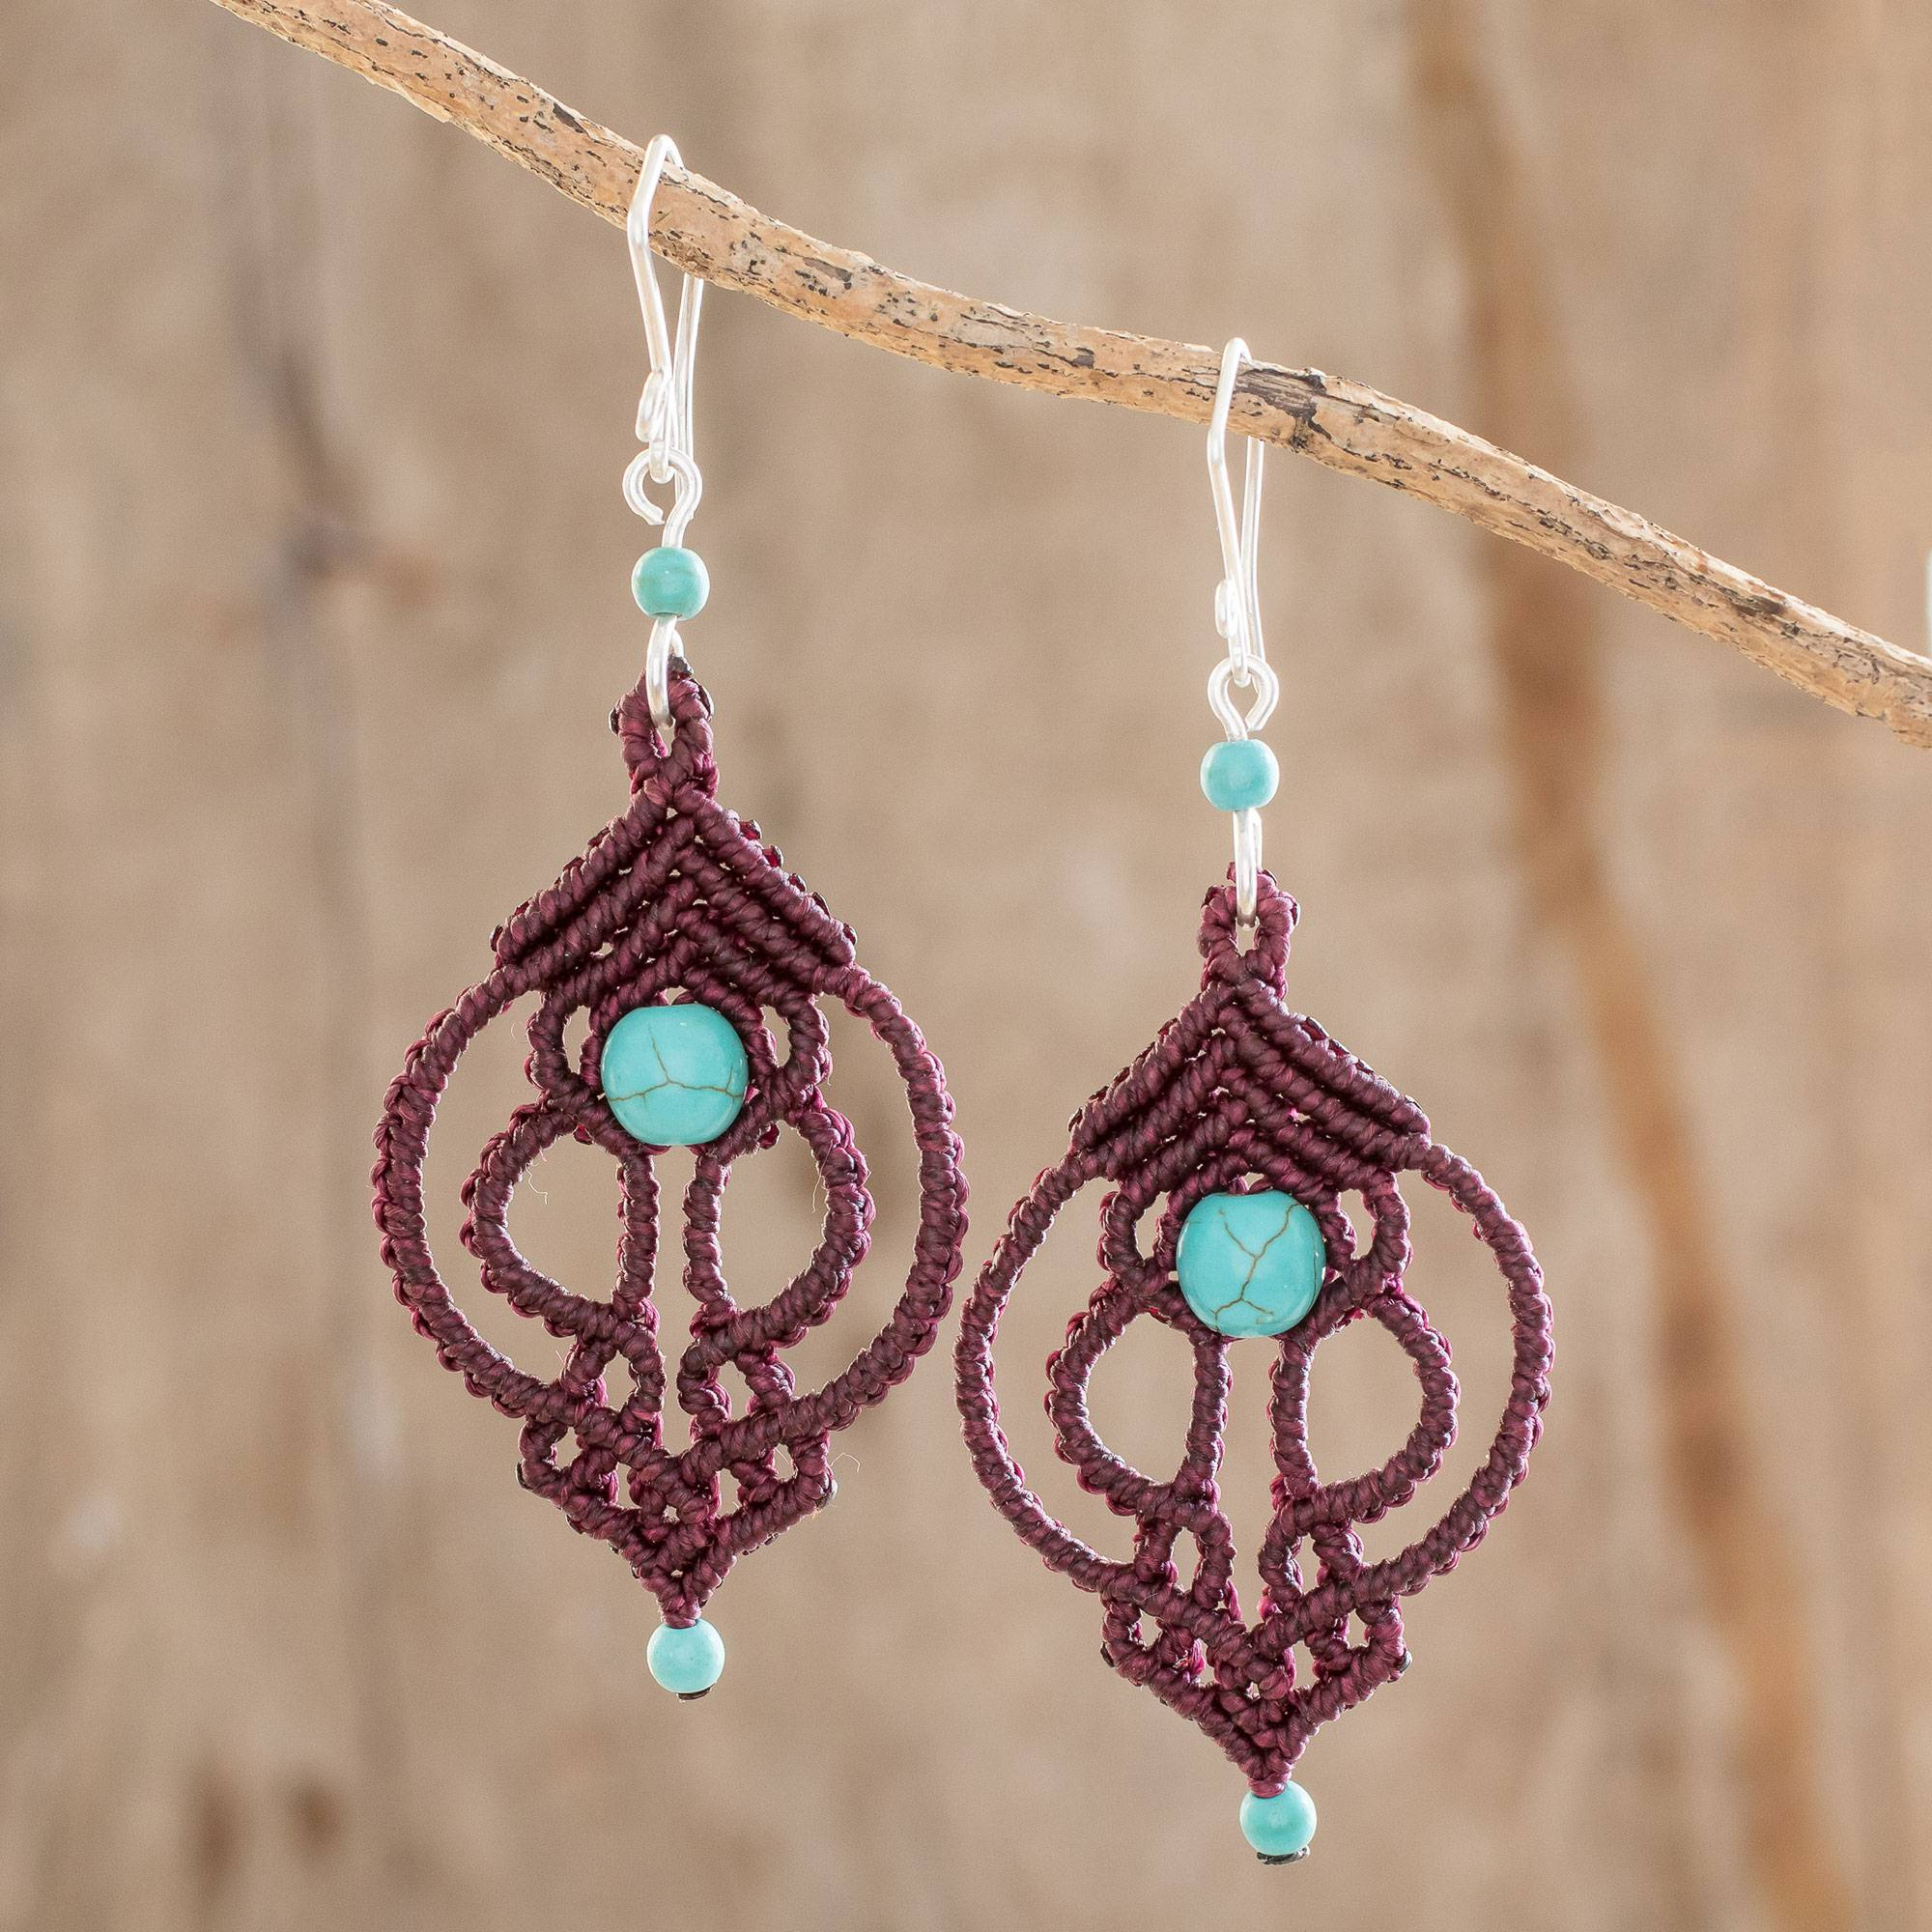 Macrame dangle earrings